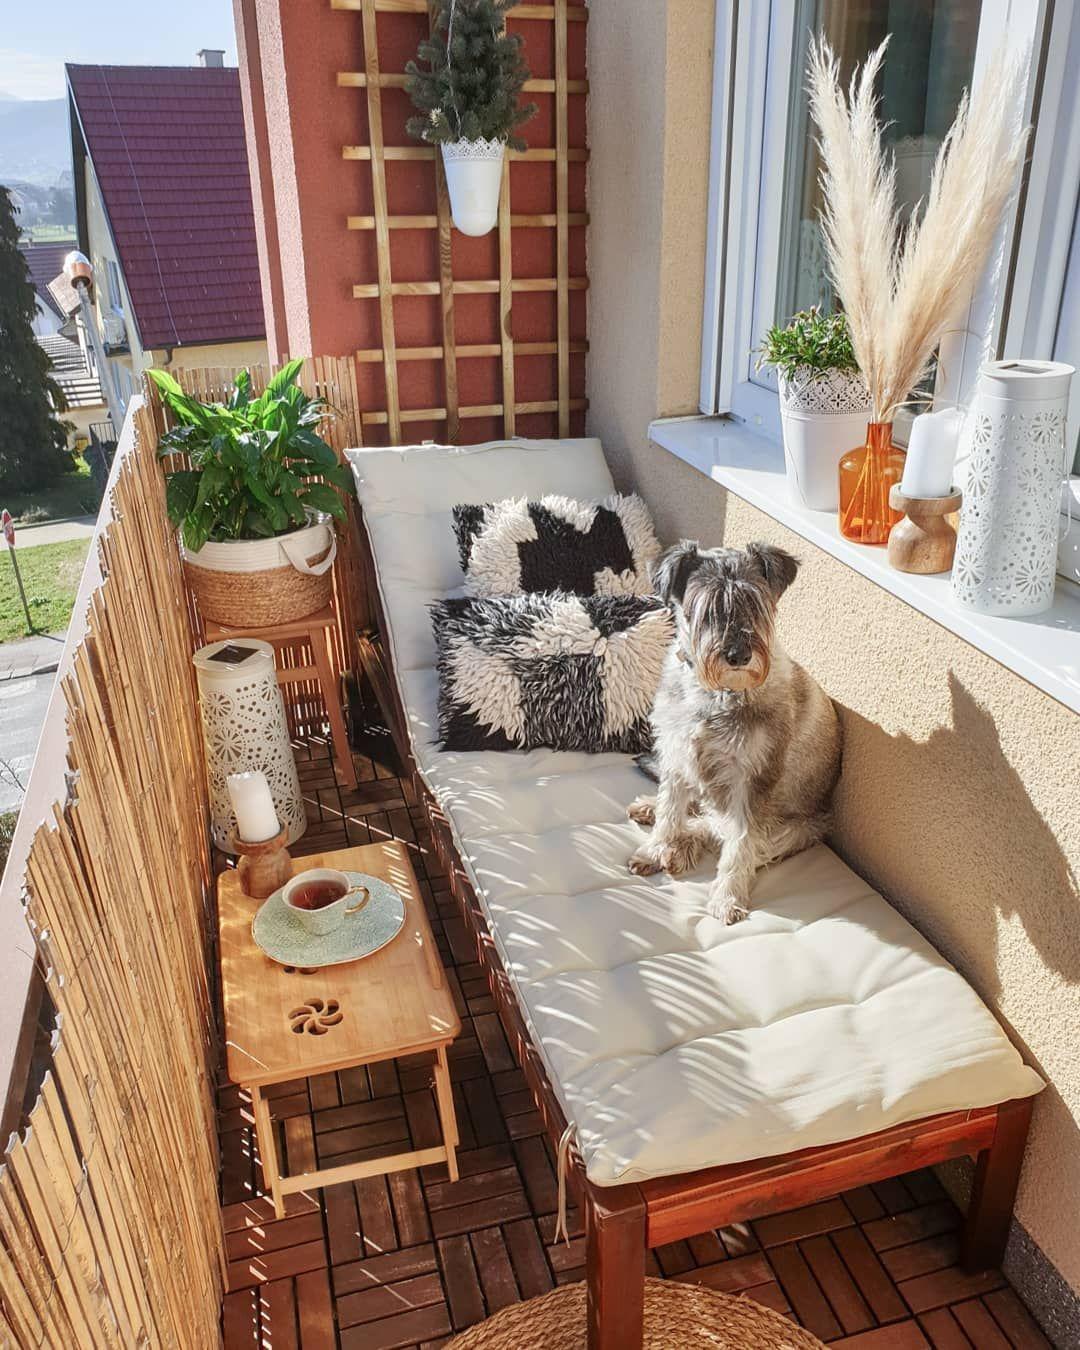 21 Cozy and Stylish Small Balcony Design Ideas #smallbalconydecor